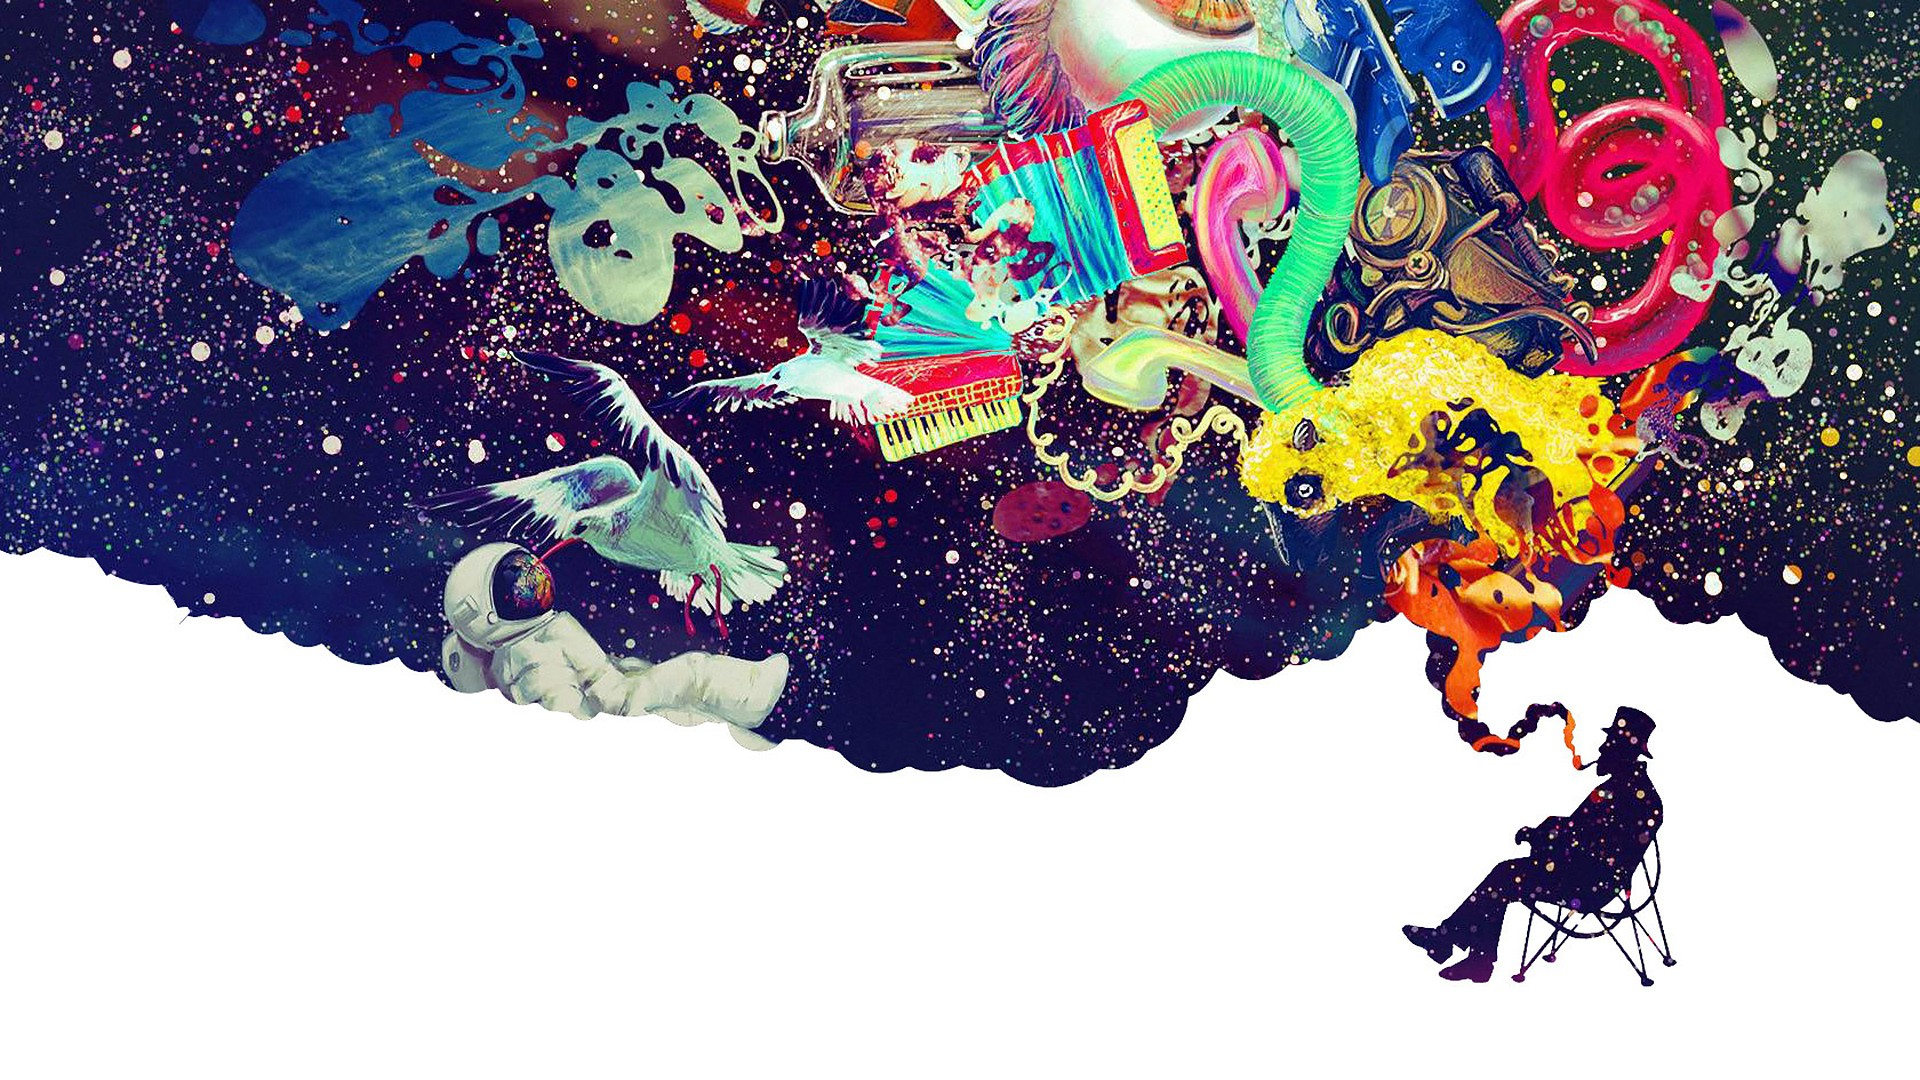 Triipy clipart desktop background Expressing Wallpaper Yourself DesktopFunky and